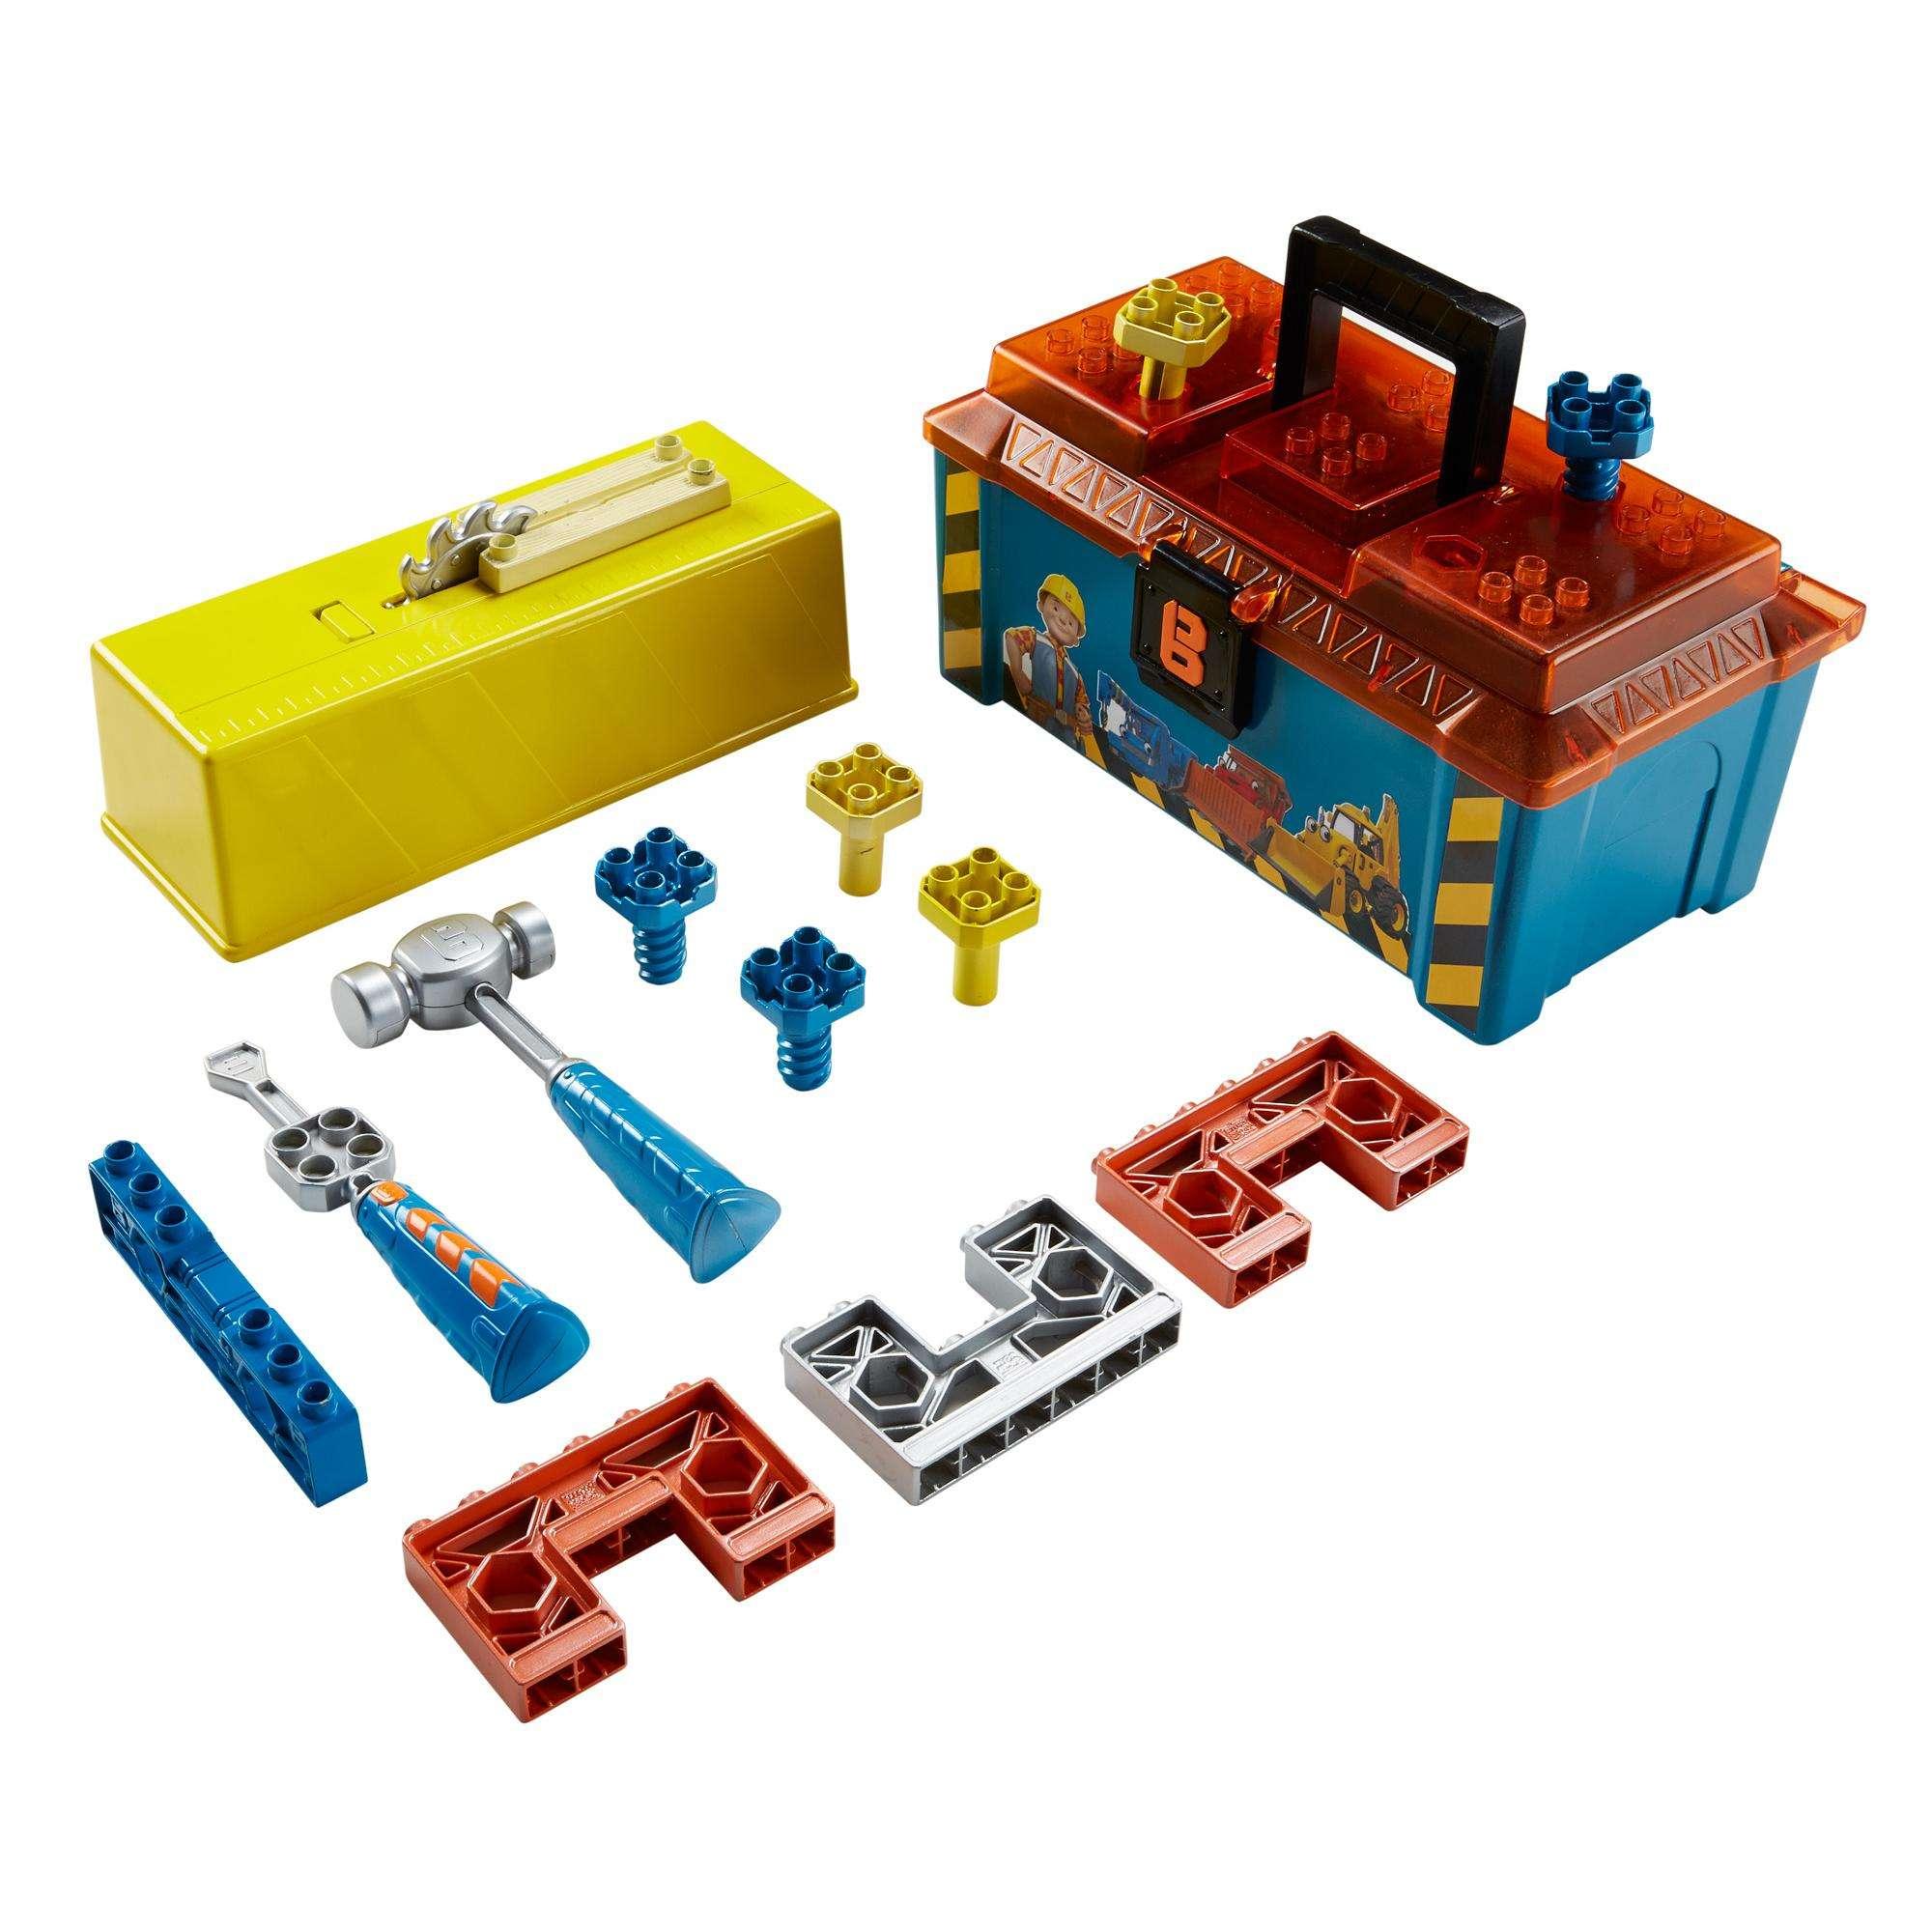 Bob the Builder Build & Saw Toolbox $9.99 + Free Store Pickup ~ Walmart